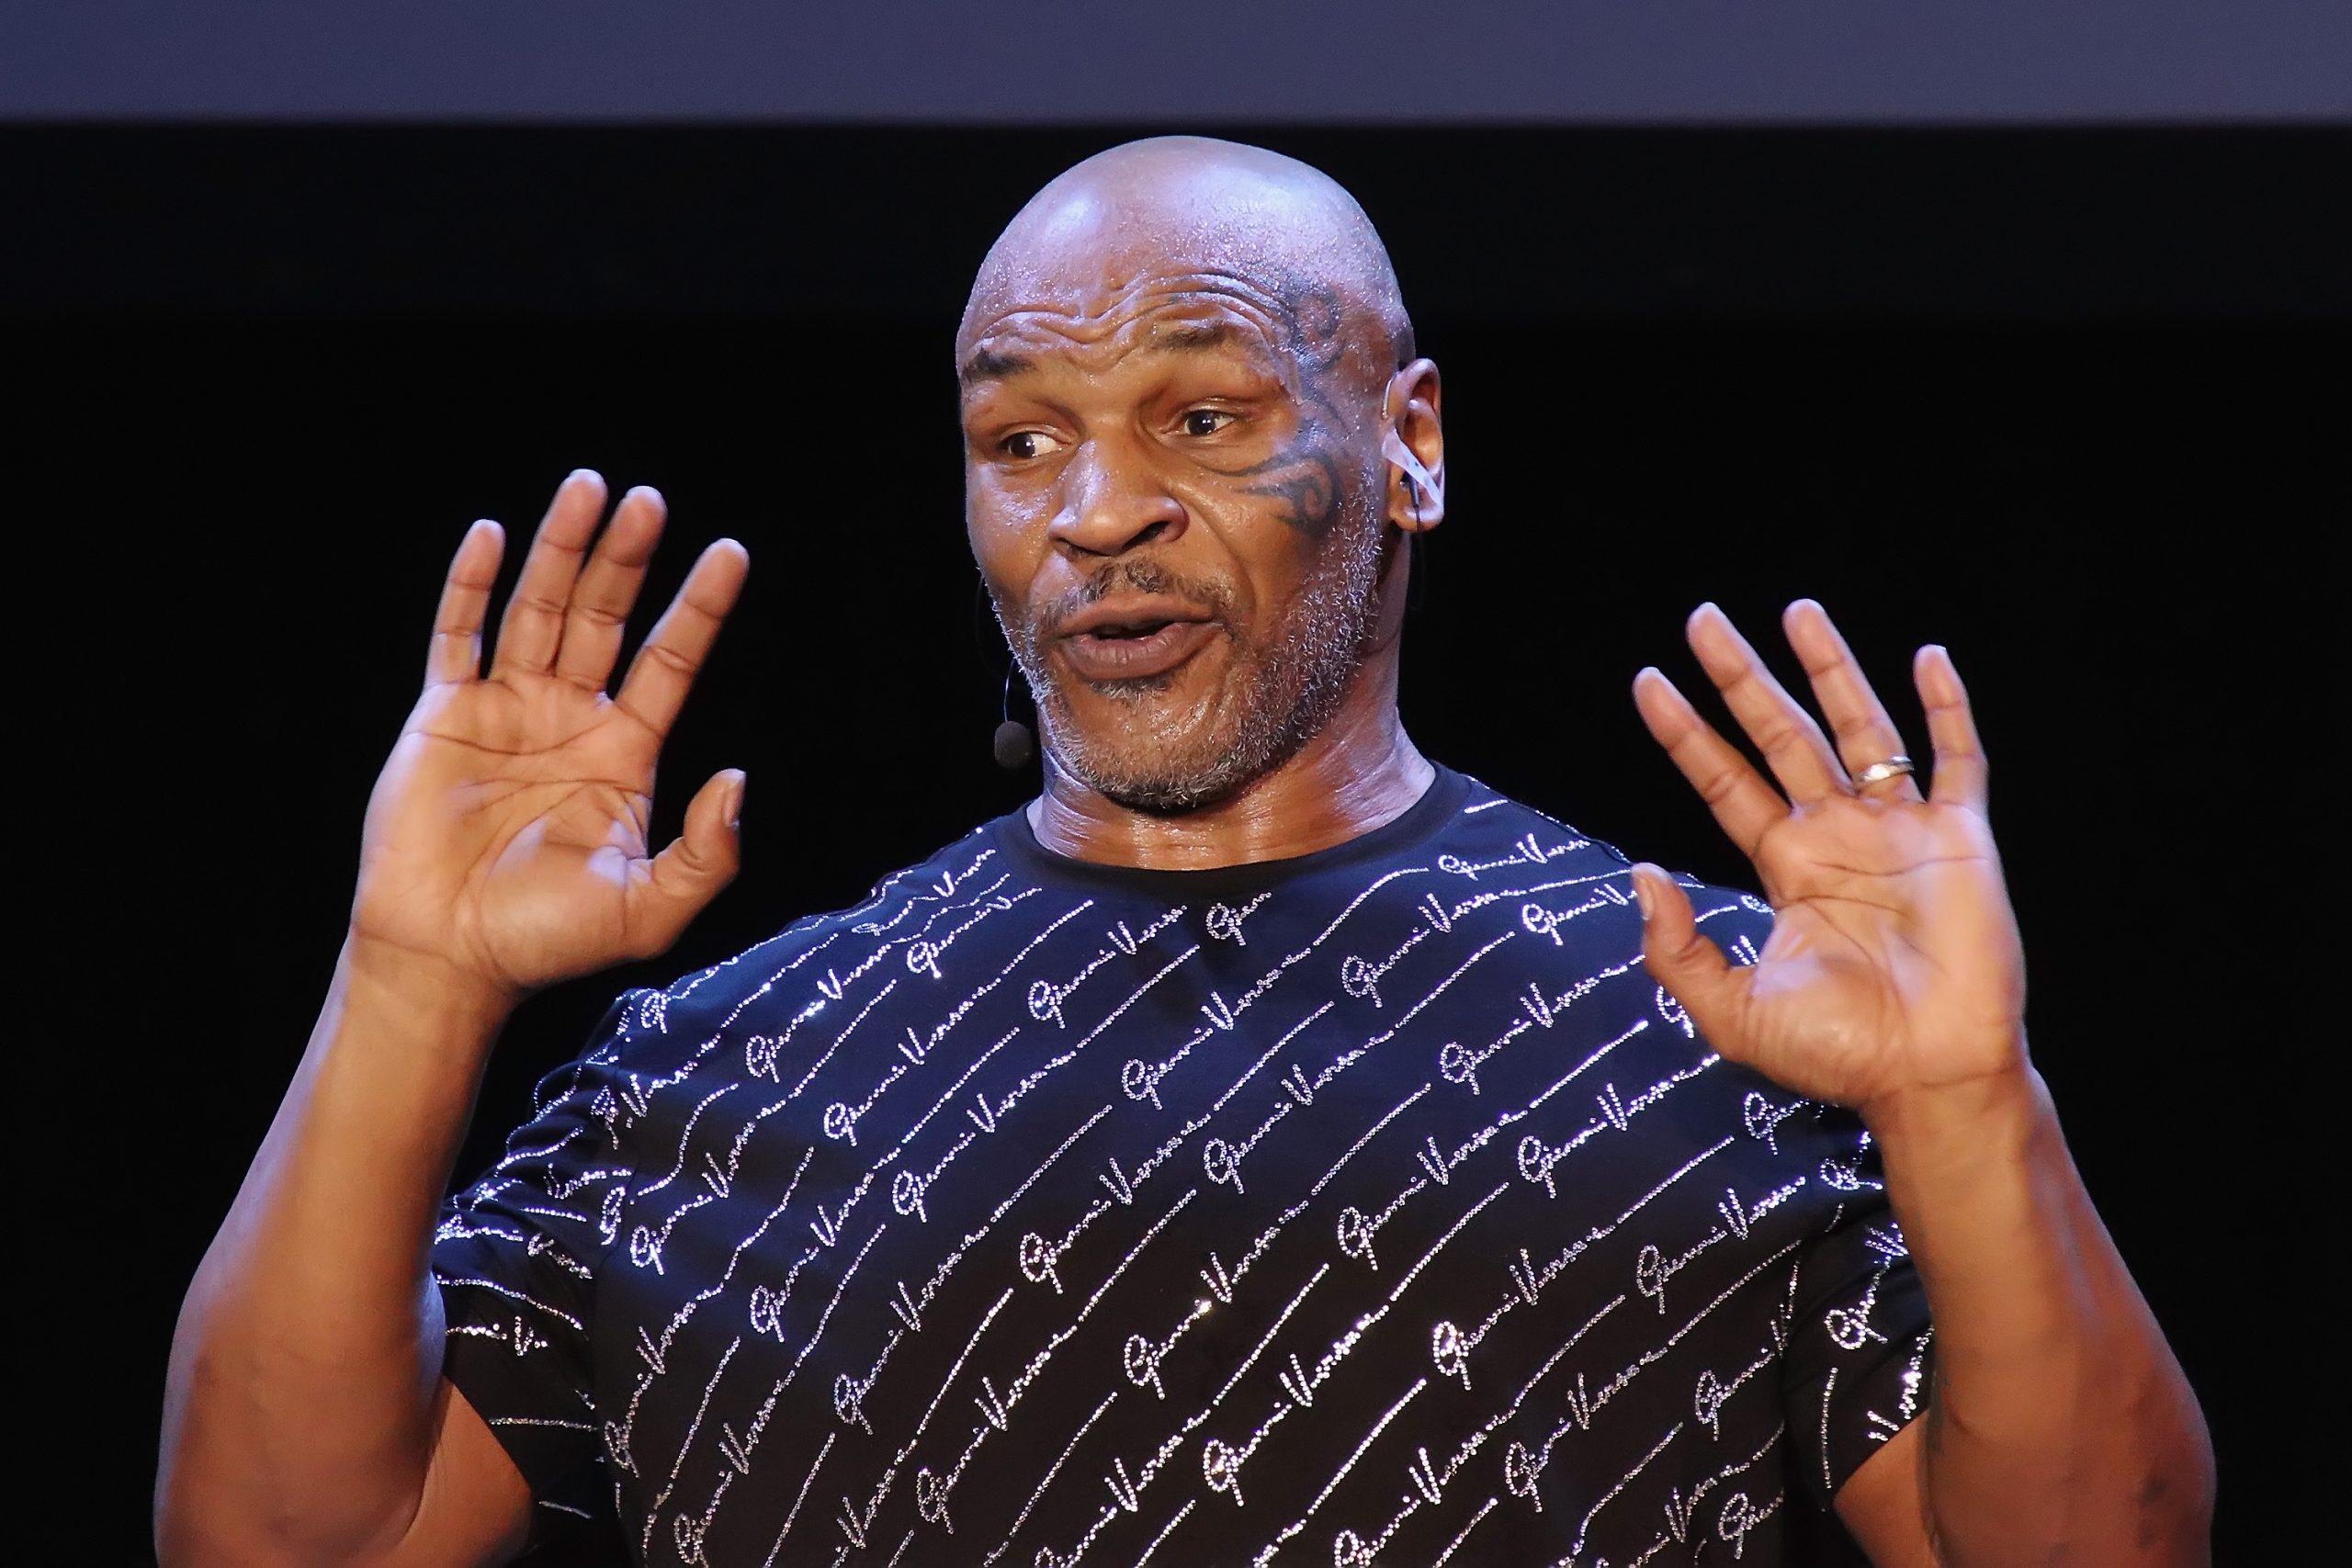 Mike Tyson Absinent 5 years